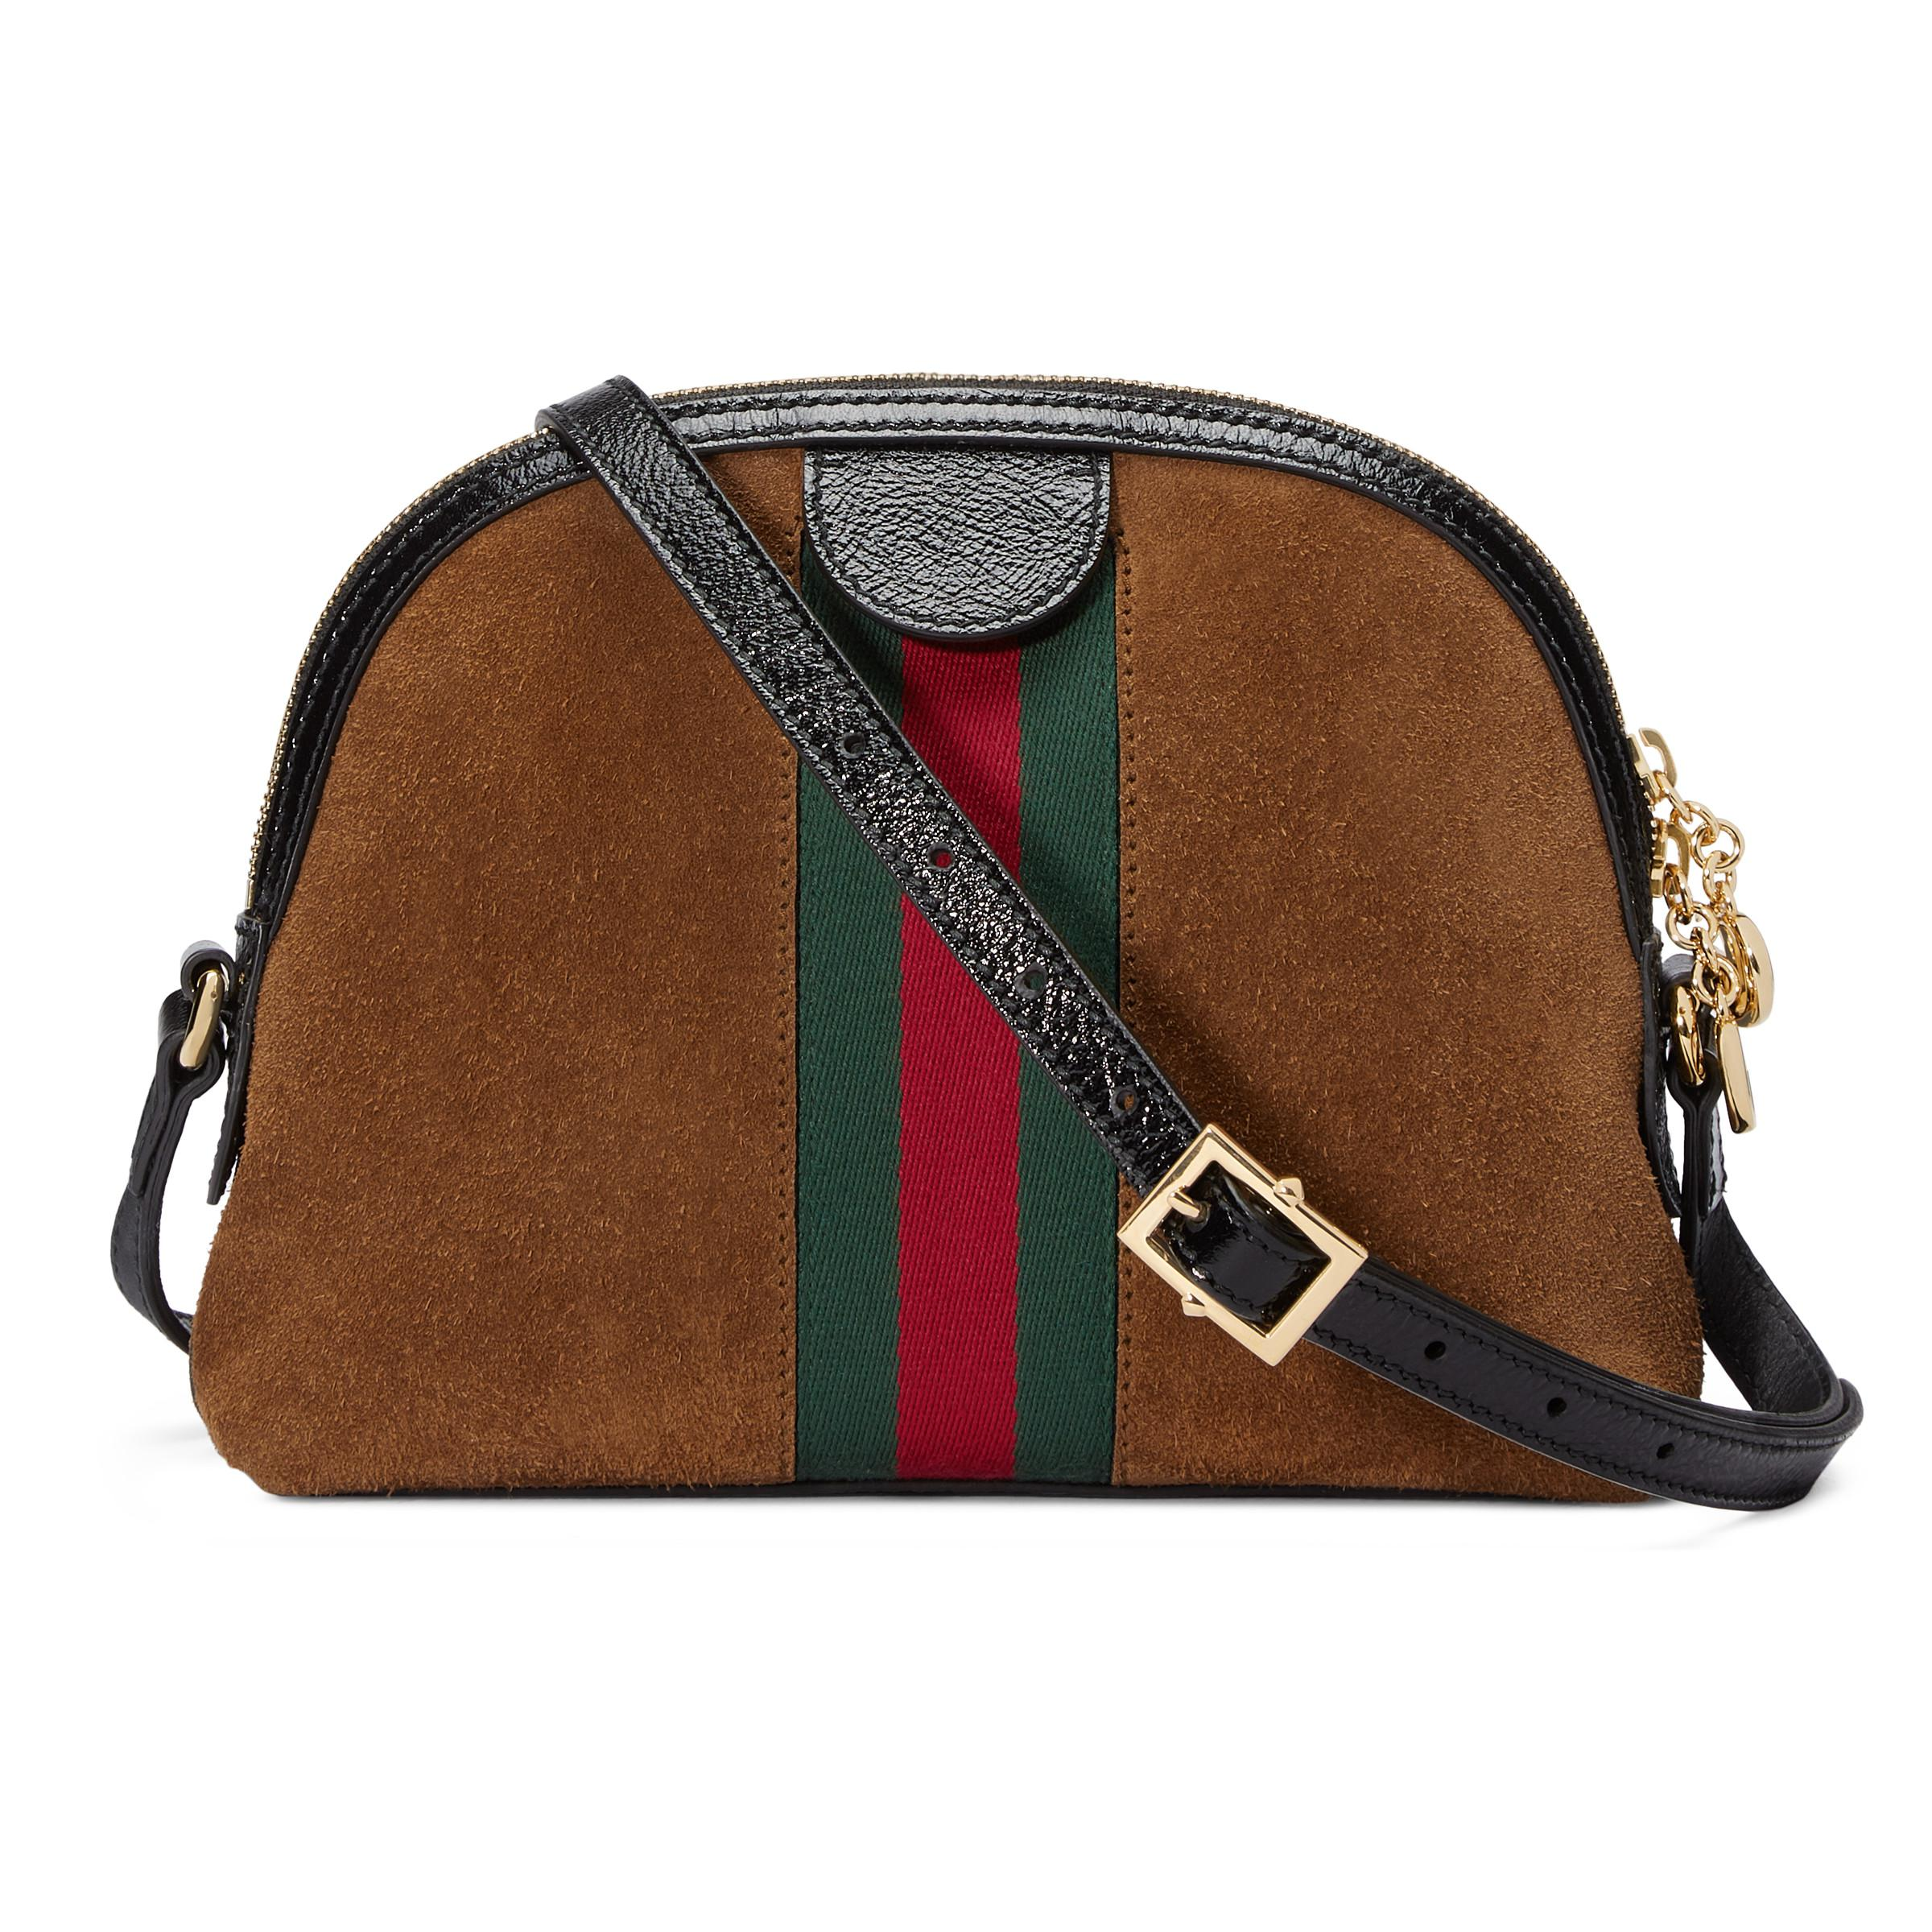 a10113c8012 Gucci - Brown Linea Dragoni Suede Small Chain Shoulder Bag - Lyst. View  fullscreen